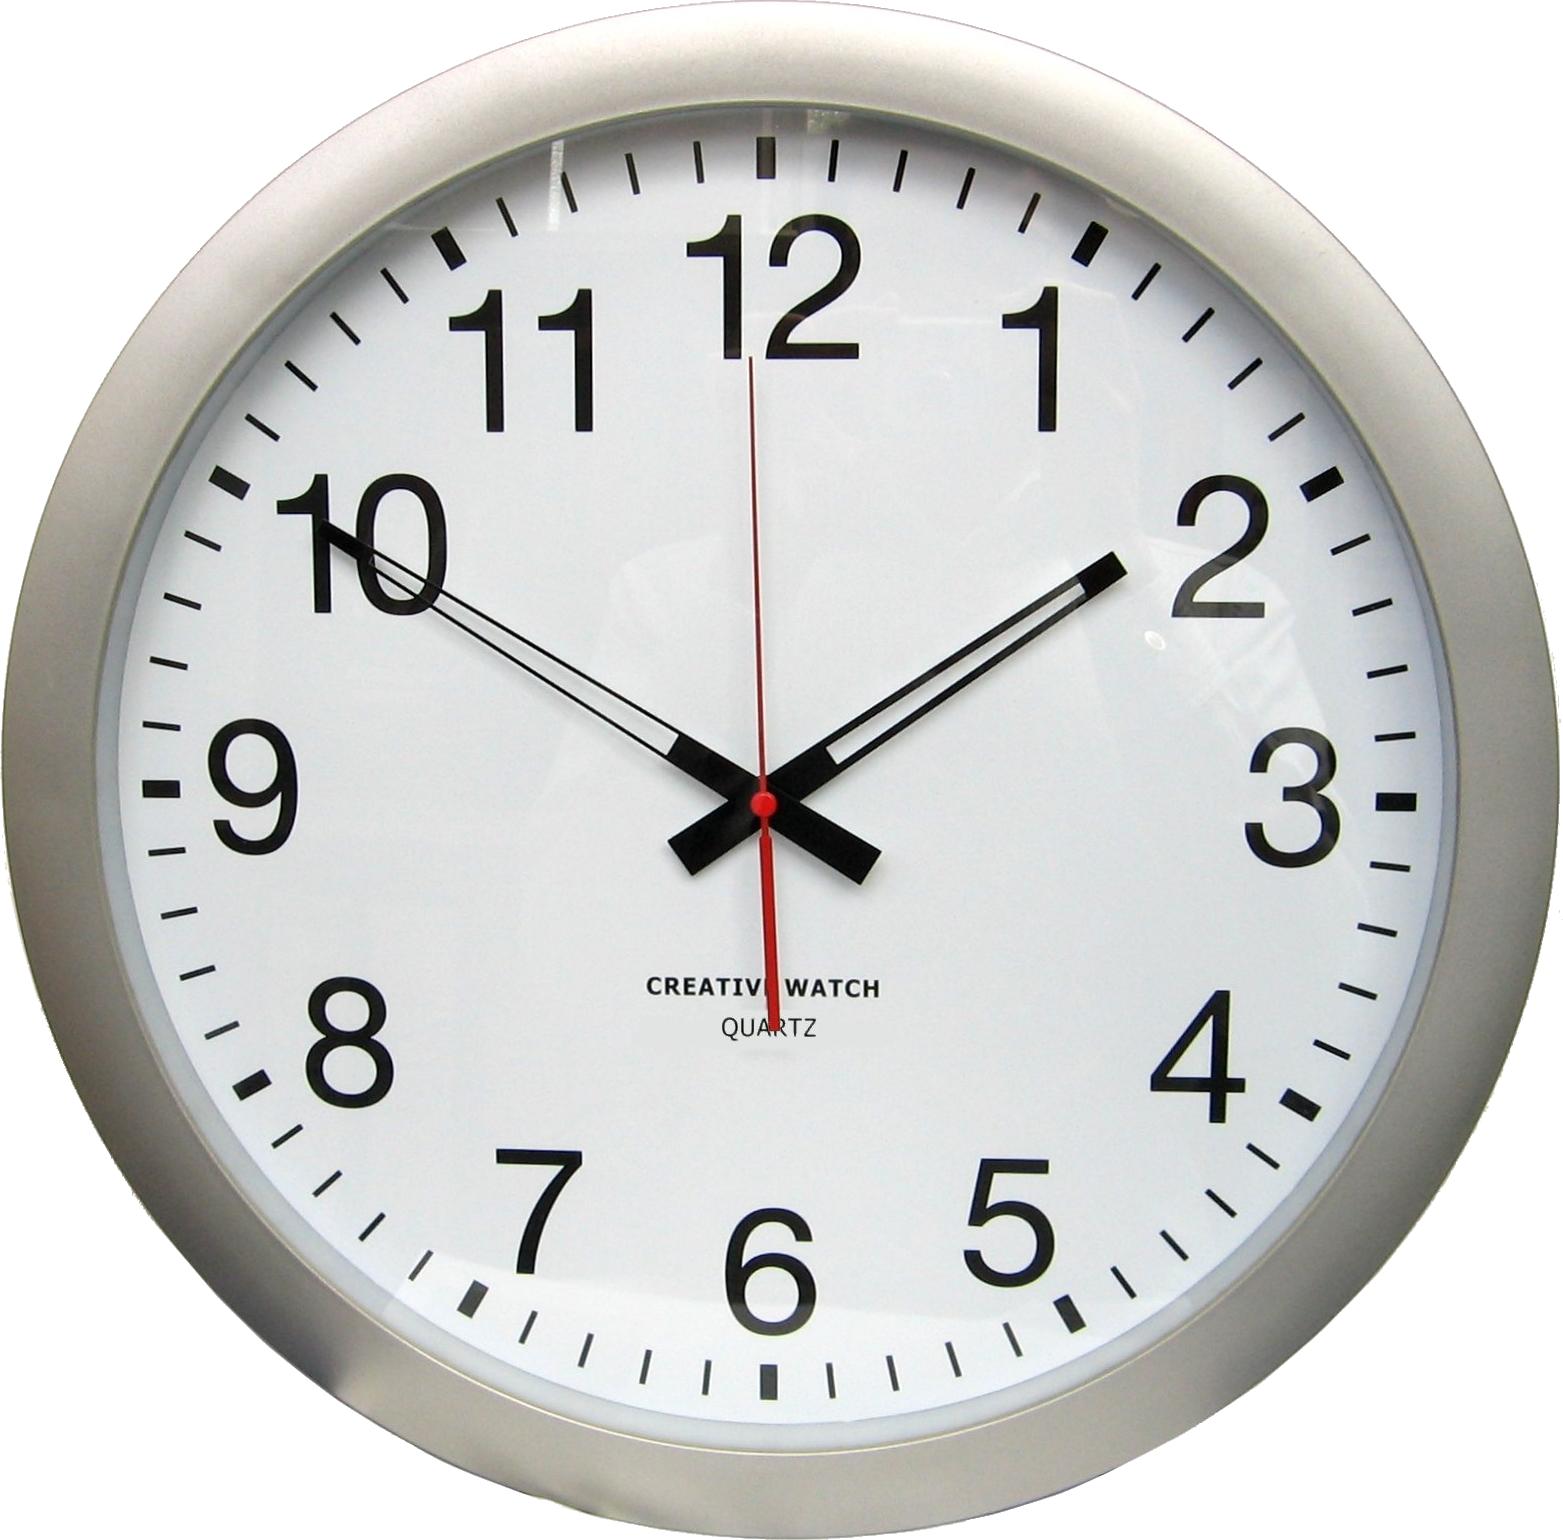 Clock PNG image - Clock PNG